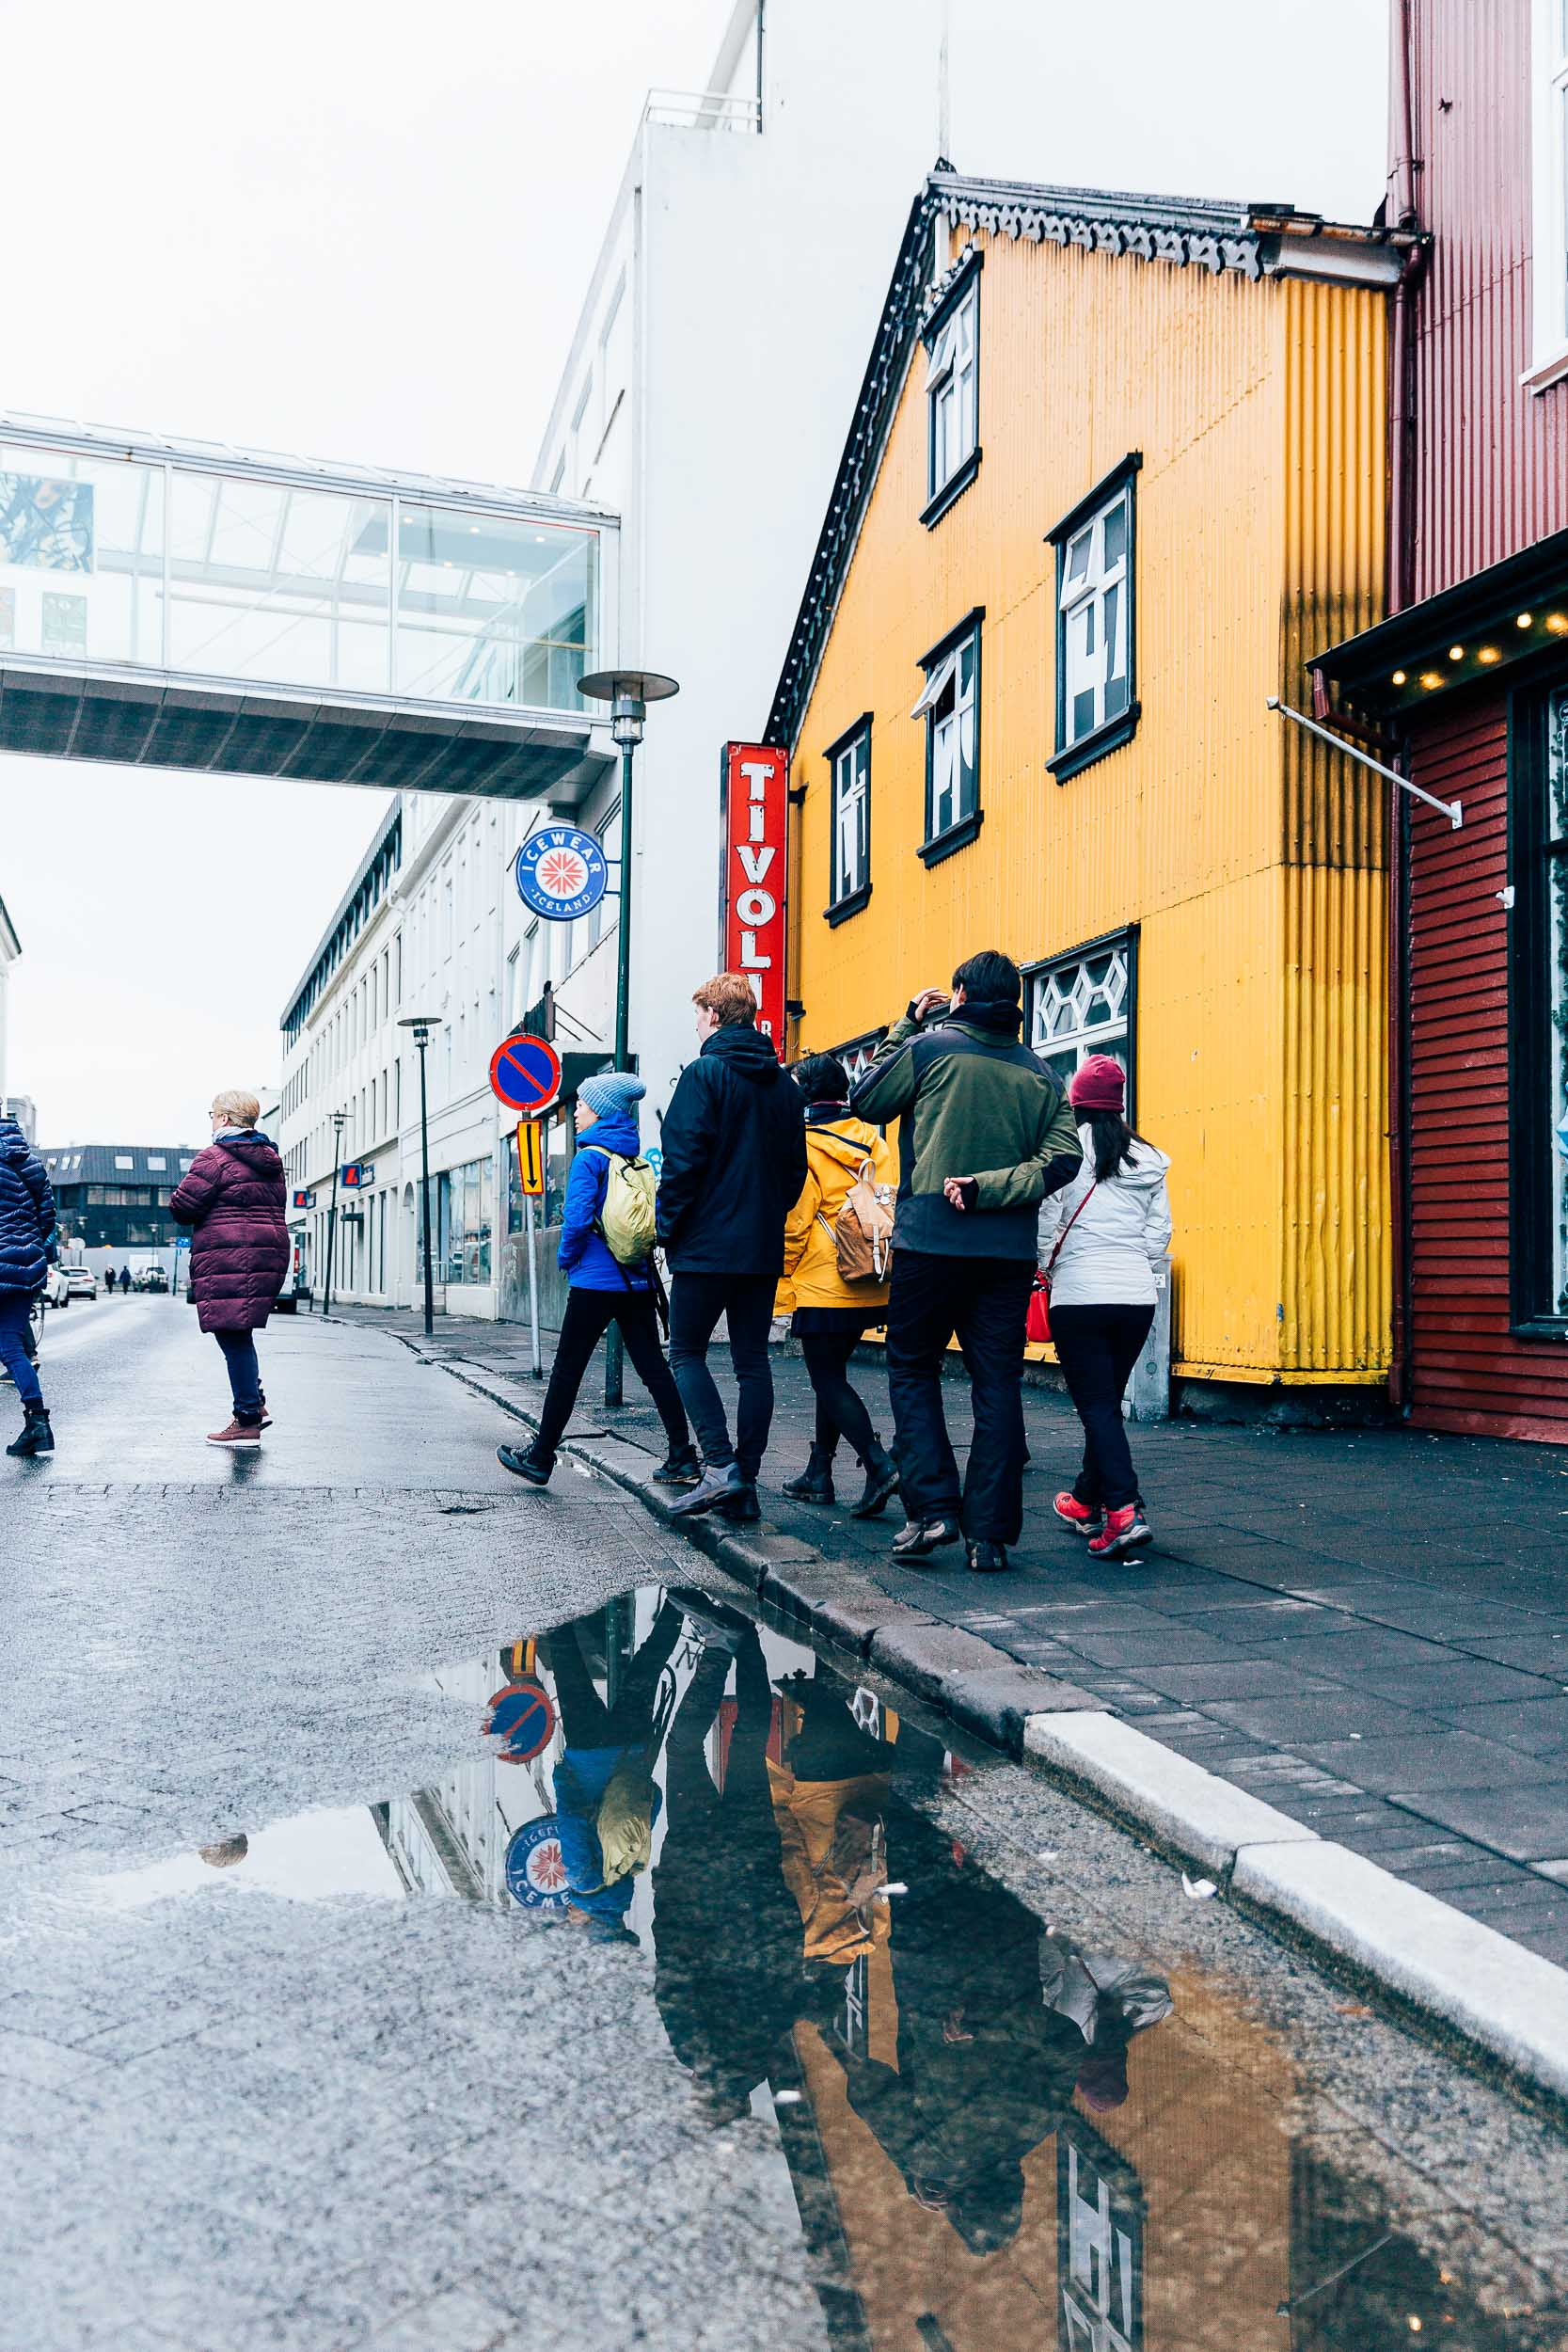 02_2019_Iceland-26.jpg